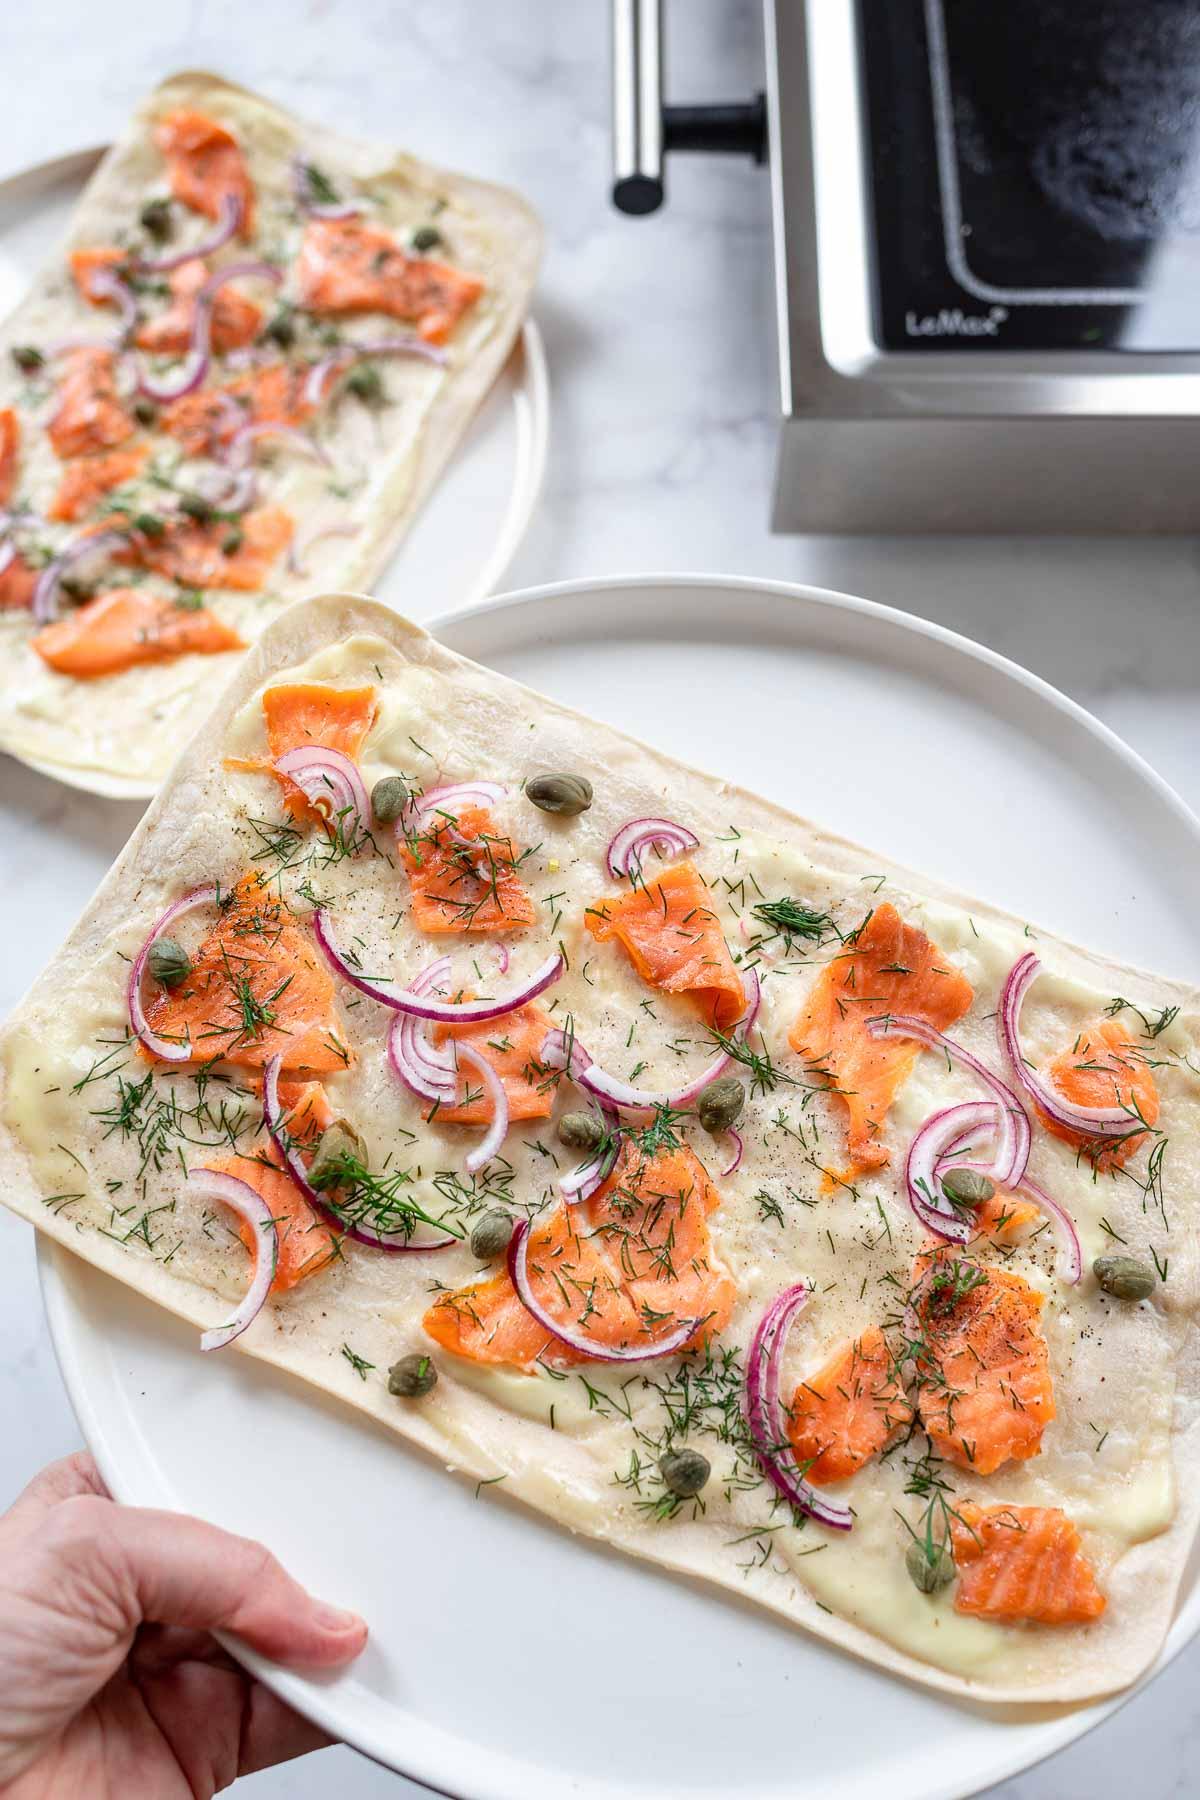 Tarte Flambée with Salmon (Flammkuchen)